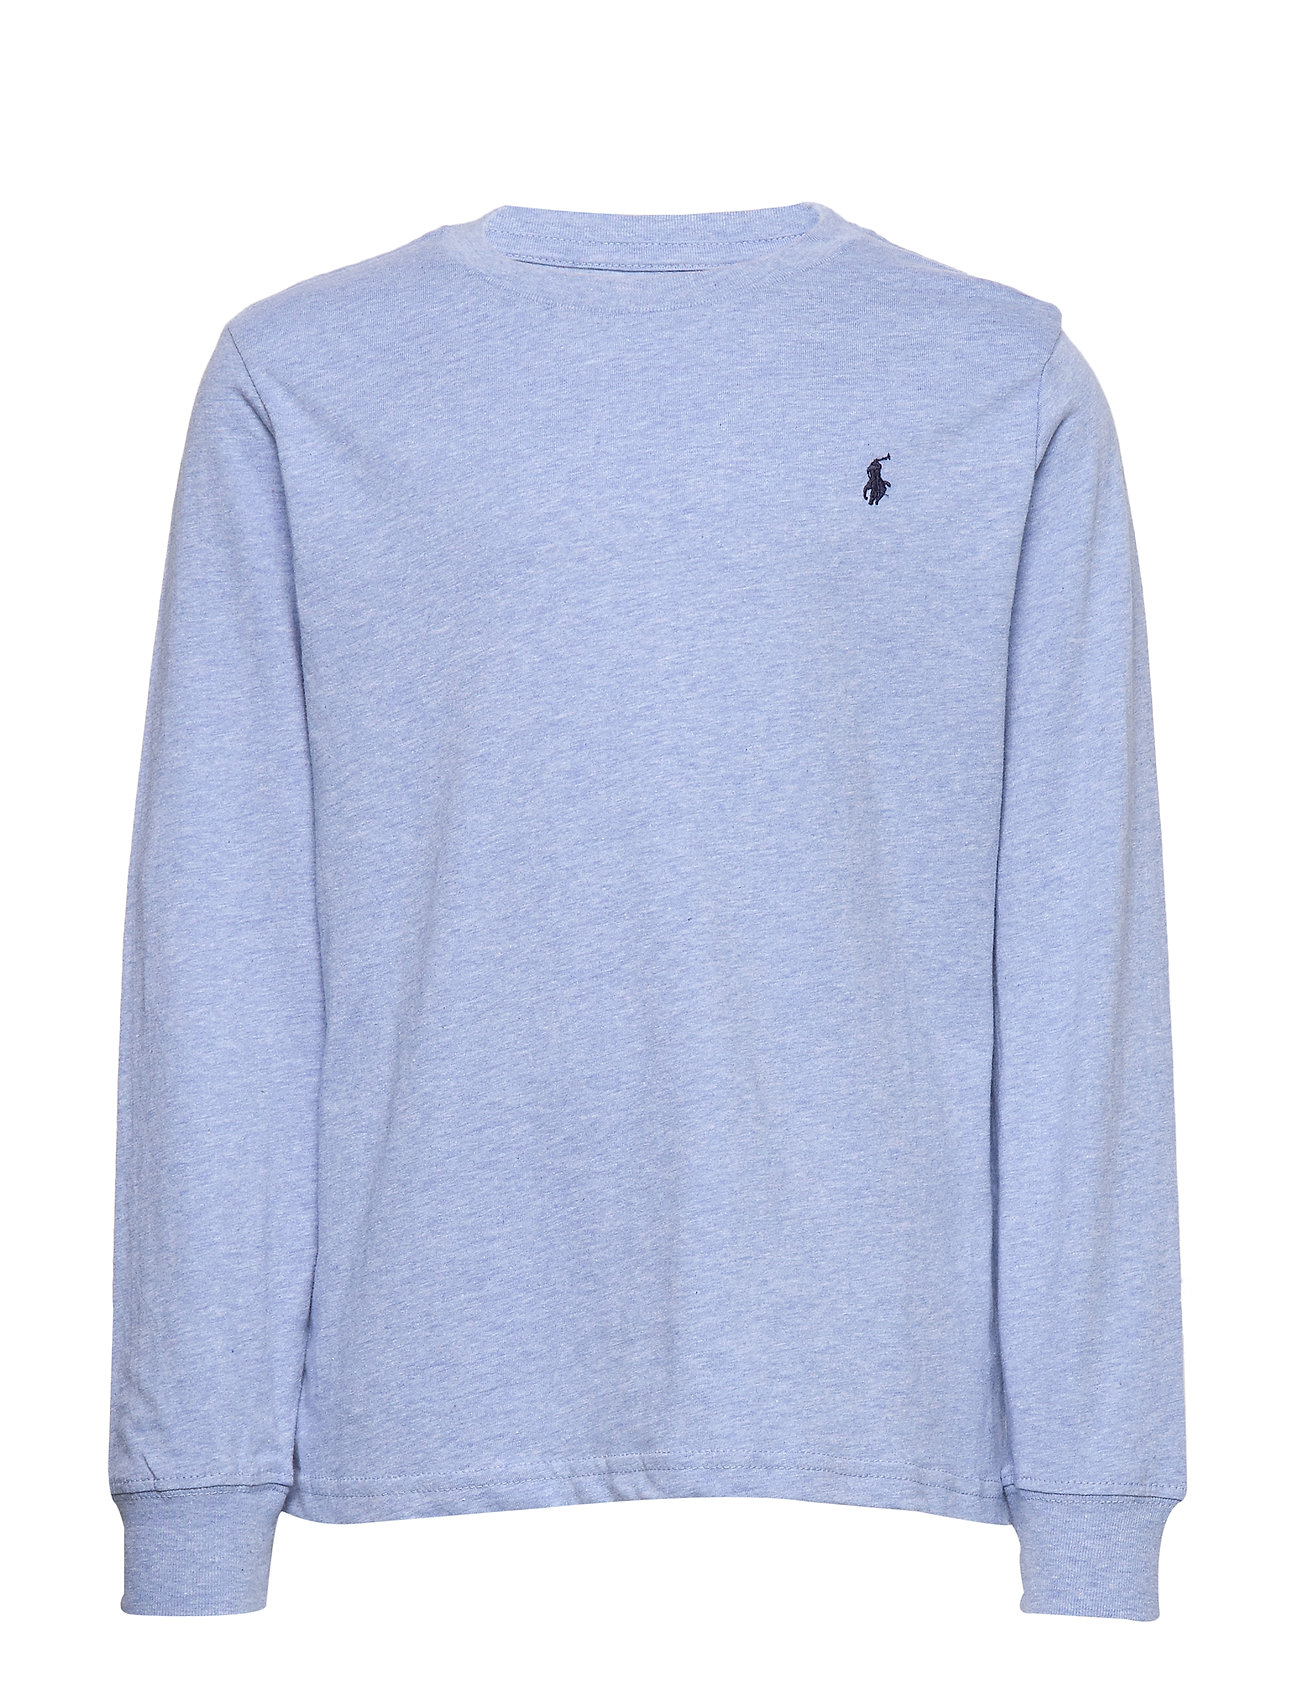 Ralph Lauren Kids Cotton Jersey Long-Sleeve Tee - COBALT HEATHER